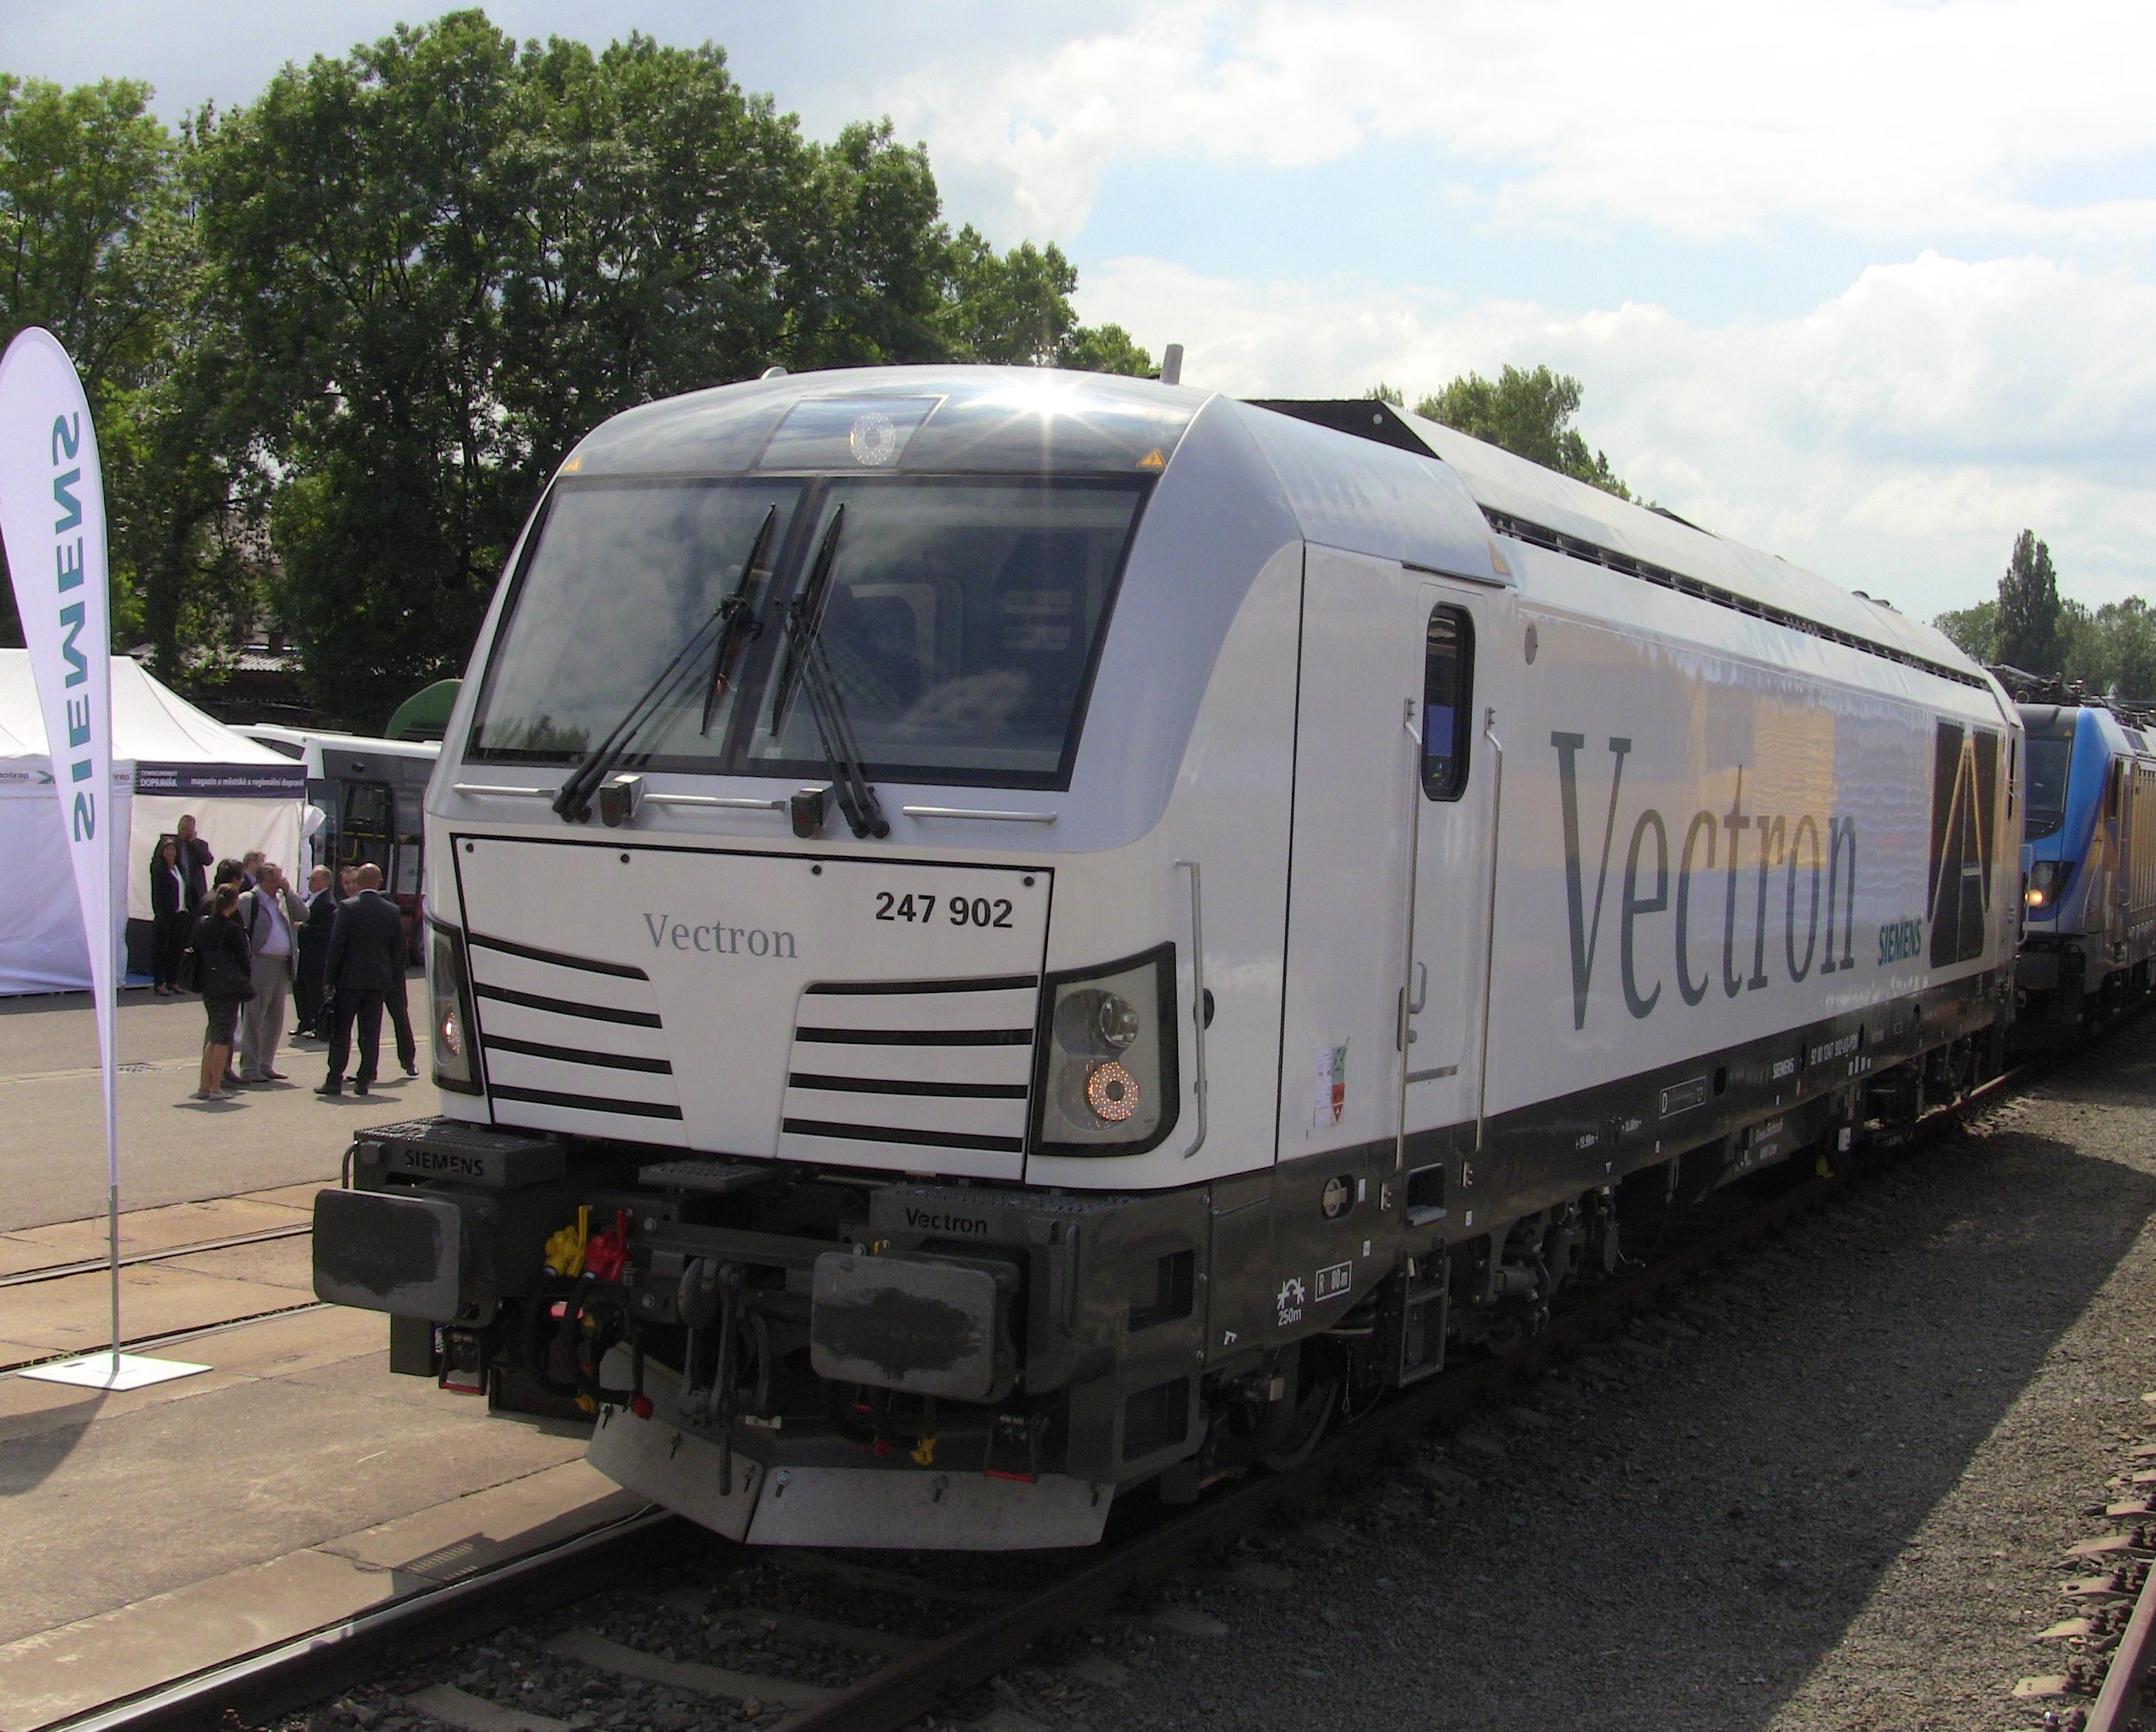 Siemens Vectron 92 80 1247 902-0